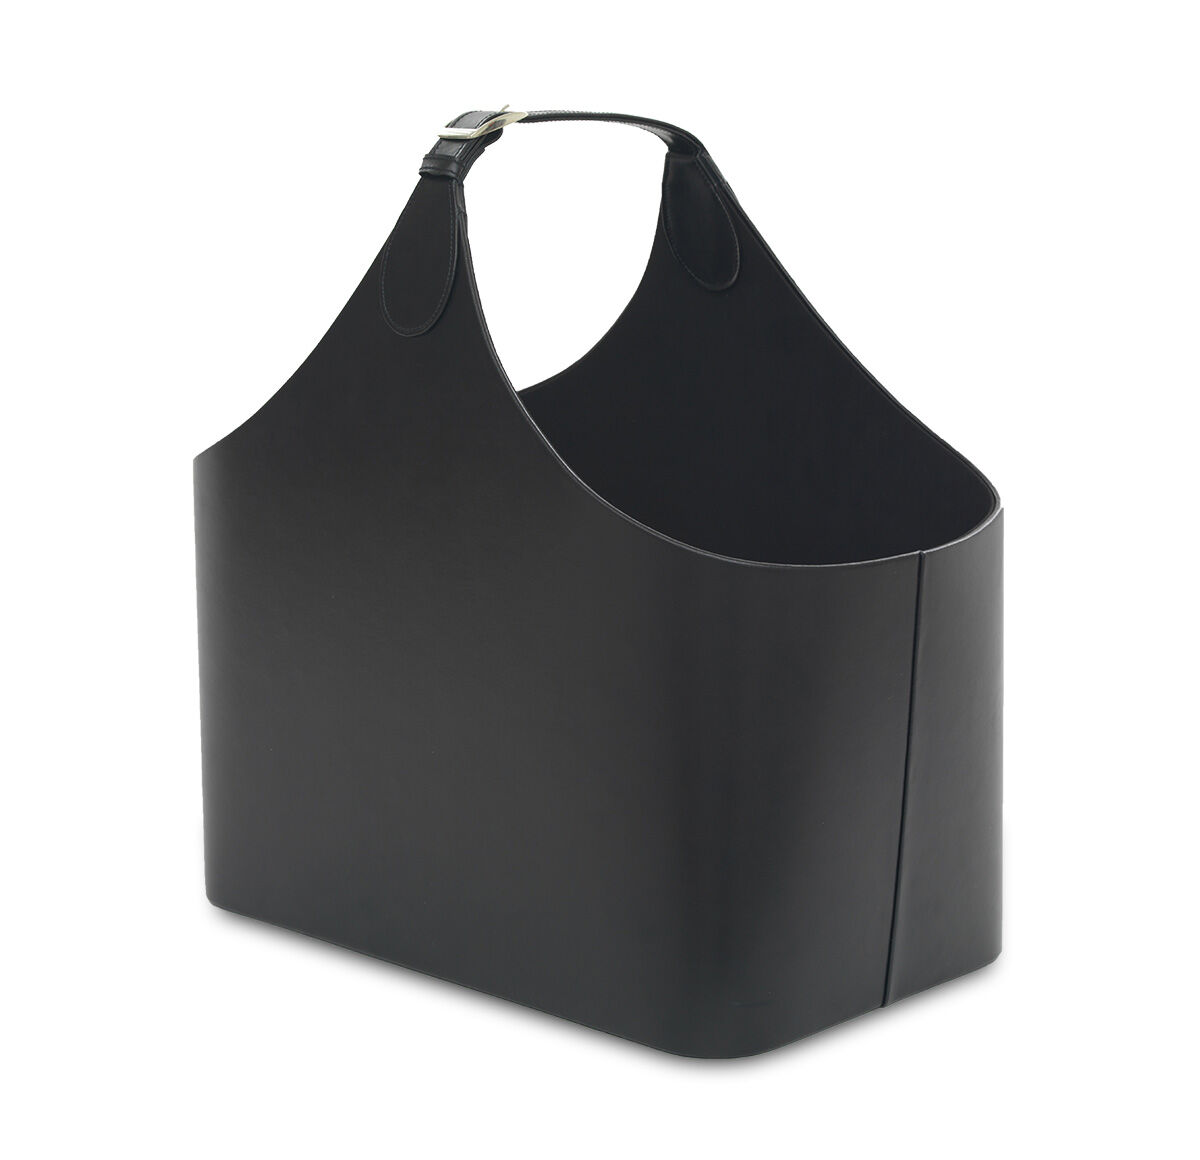 sofa sleeper on clearance leather cleaning miami adeline black magazine holder